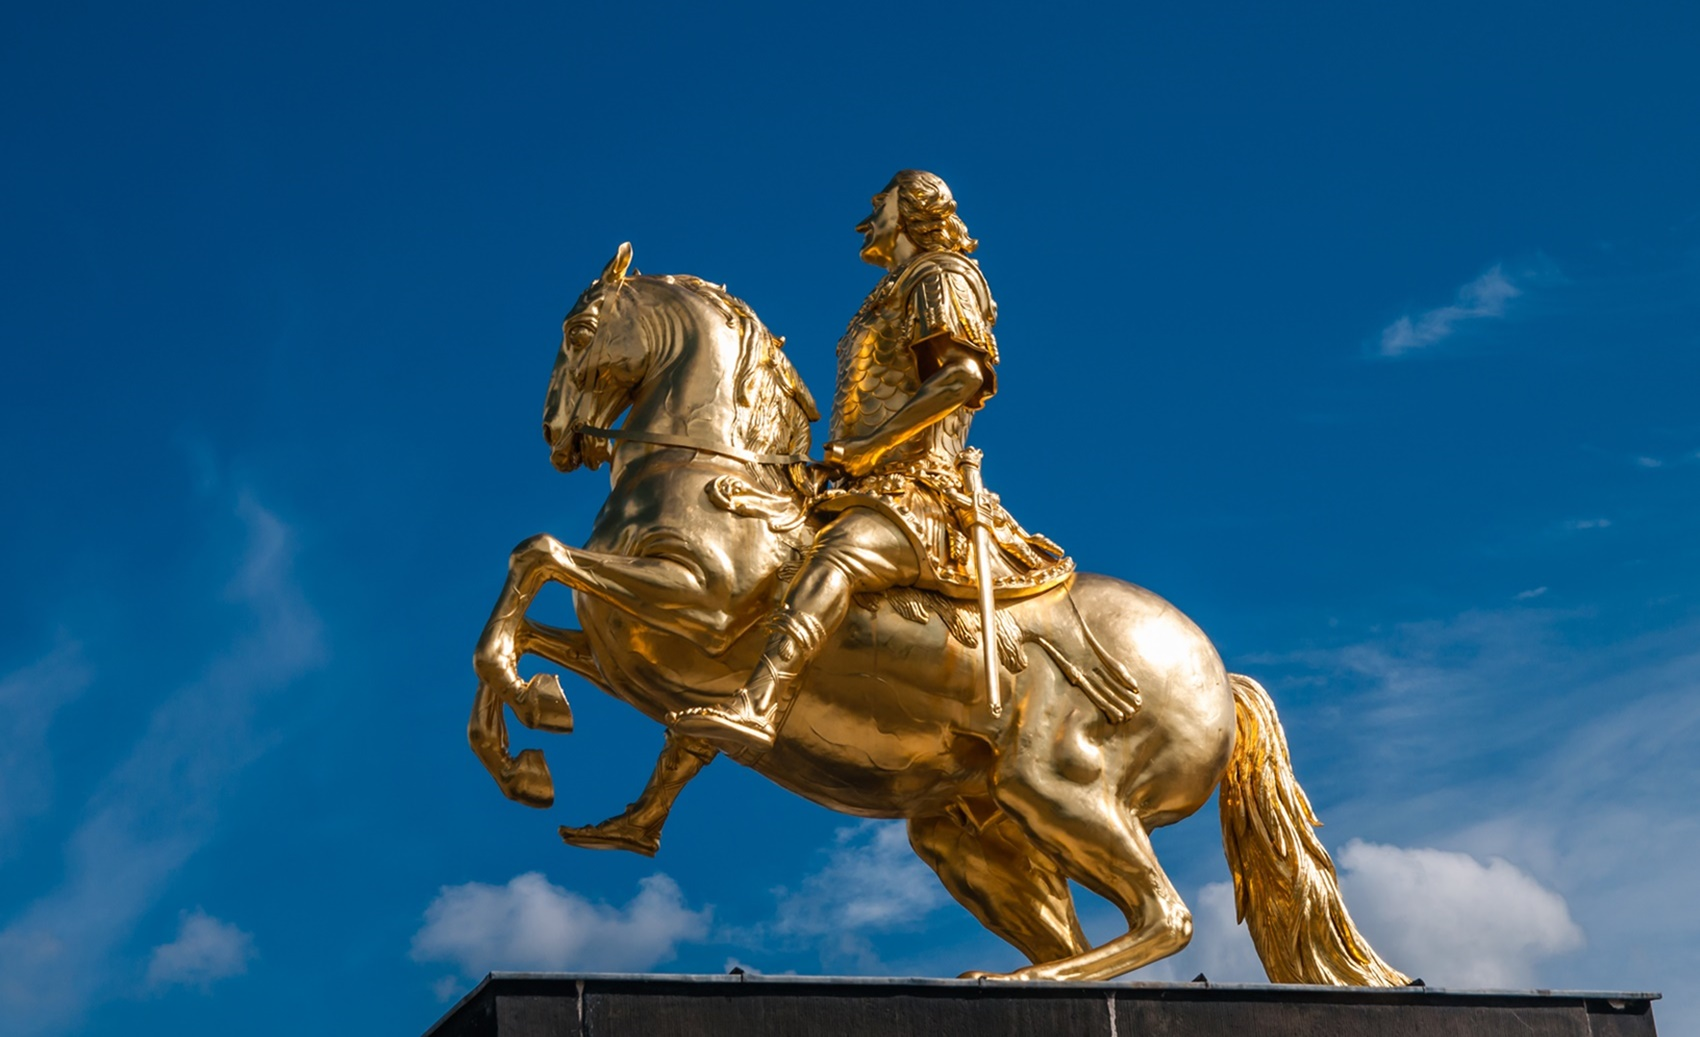 Der Goldene Reiter Denkmal In Dresden Bedeutung Geschichte